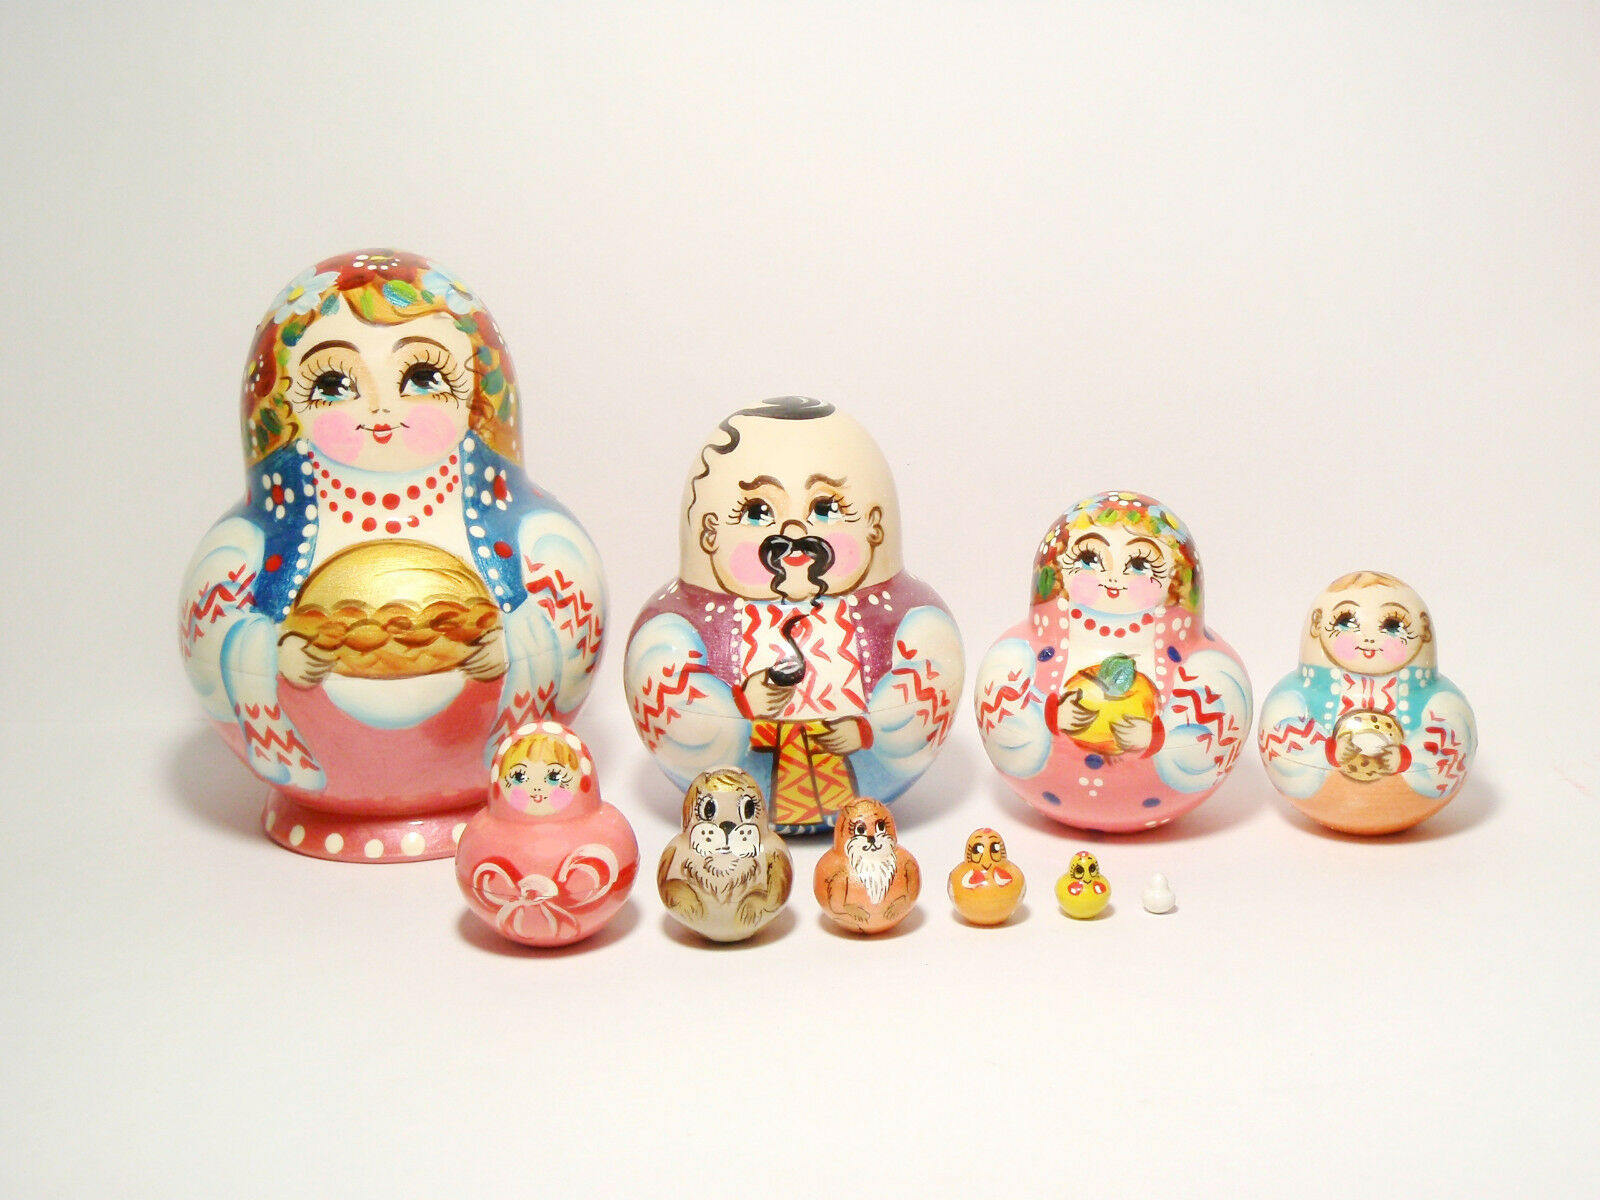 Nesting Doll Pie 10 pcs, Matryoshka Ukraine Family - Girl With Pie Doll 5,5